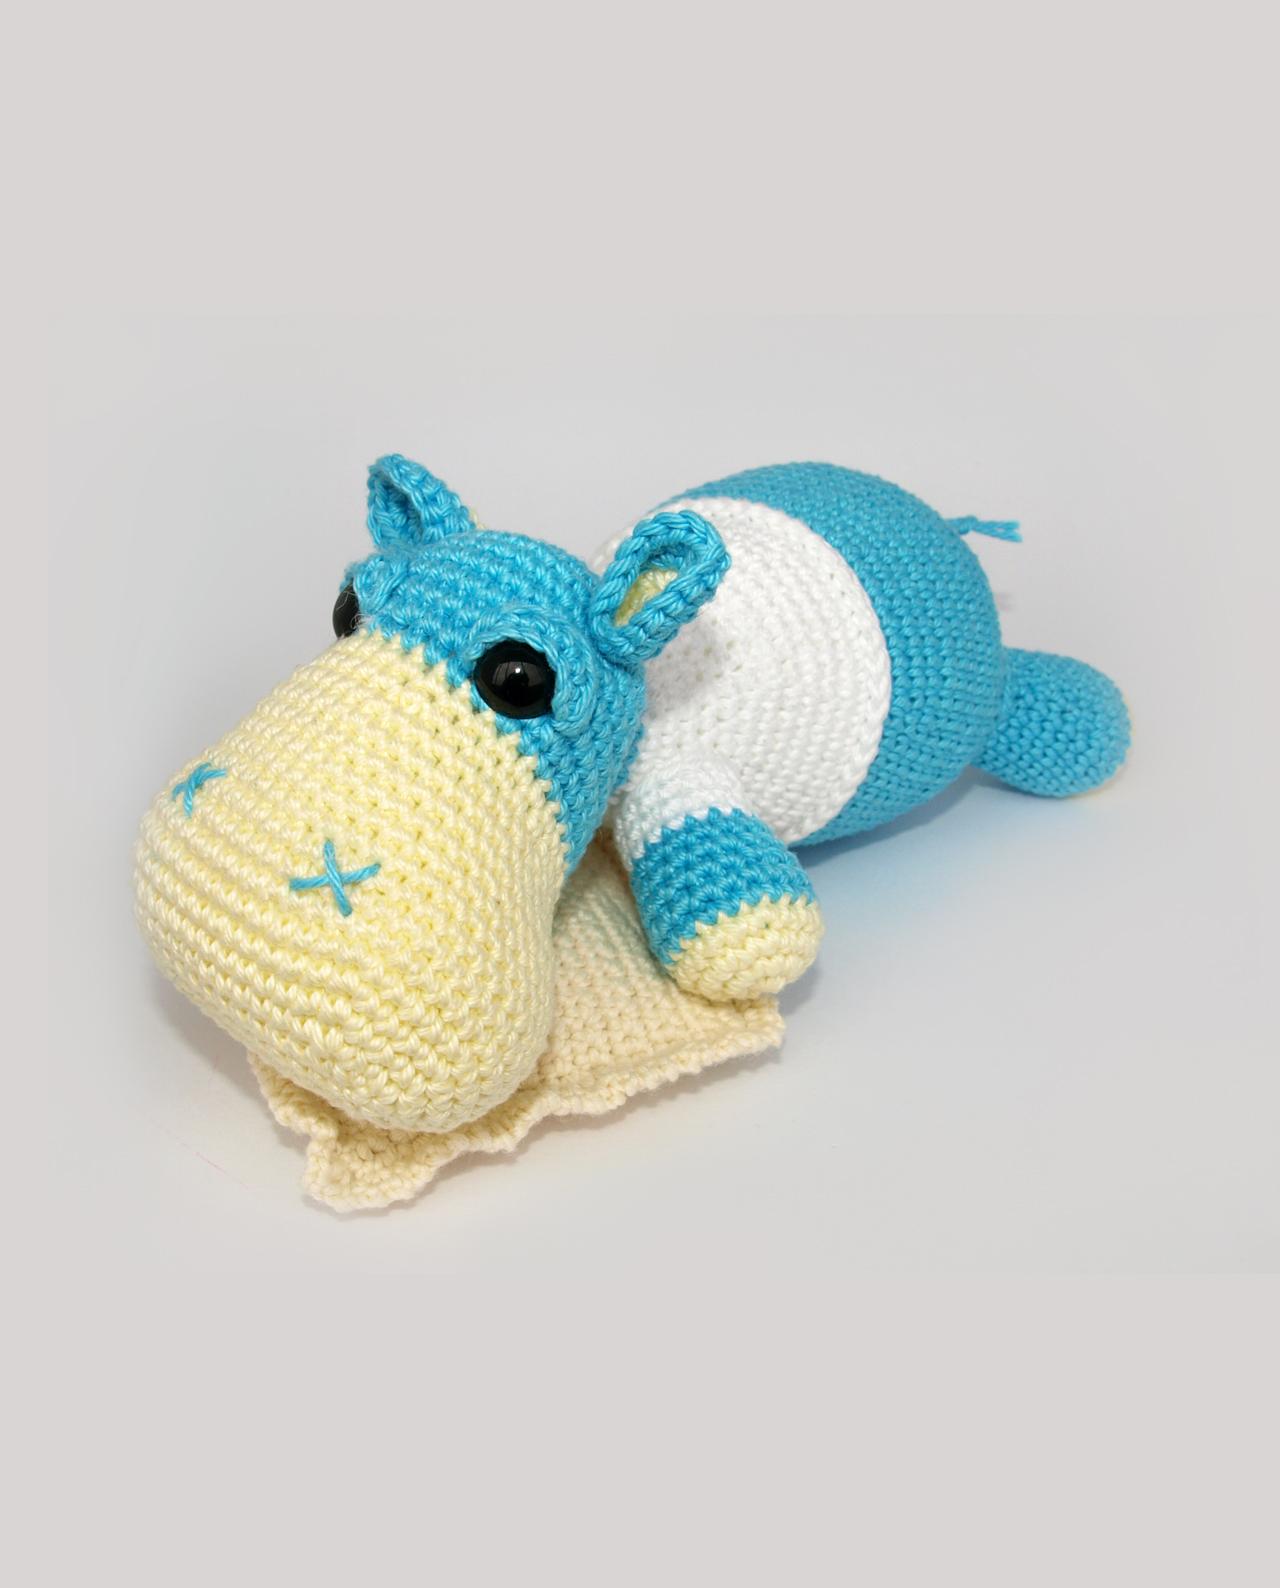 Wzor hipopotama amigurumi po polsku. Wzory amigurumi.